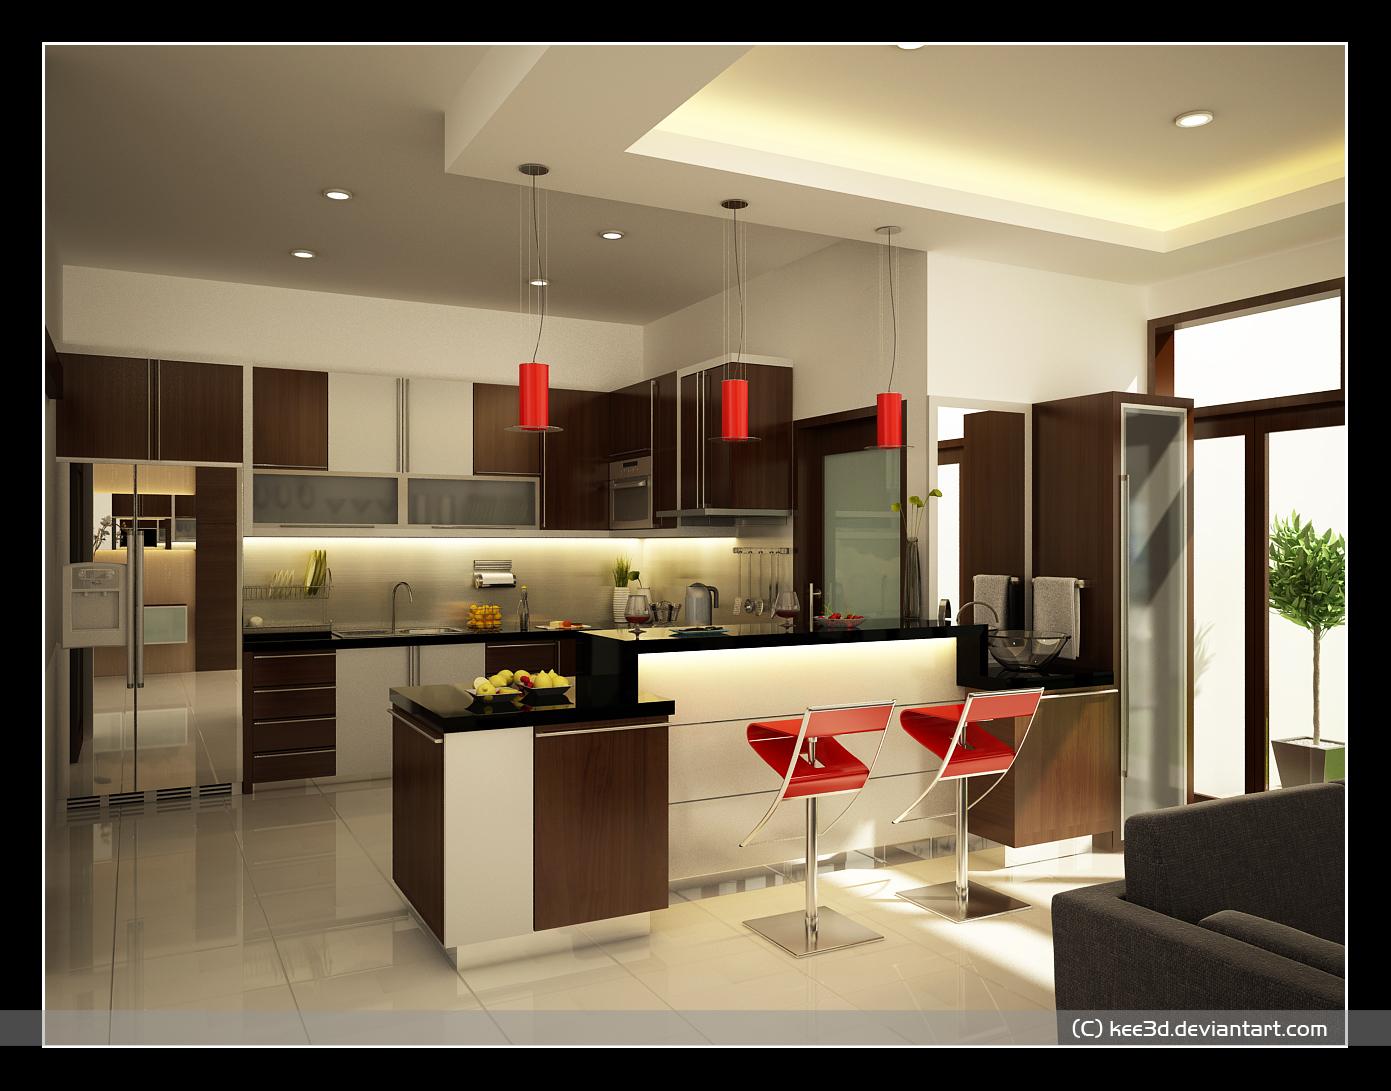 Home Interior Design  Decor Kitchen Design Ideas  Set 2